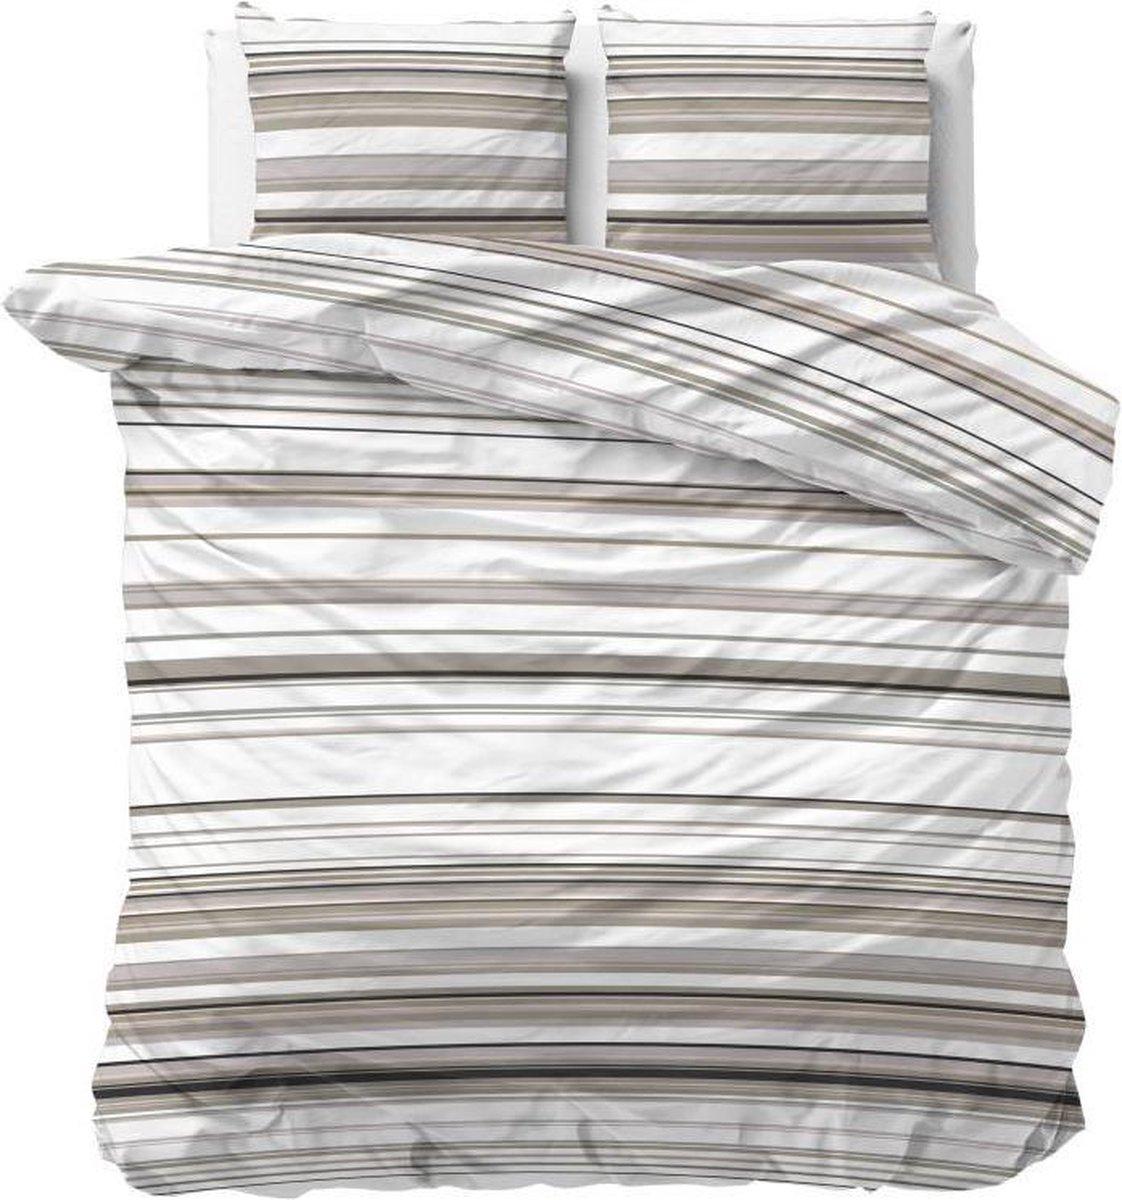 Sleeptime Benny - Dekbedovertrekset - Lits-Jumeaux - 240x200/220 + 2 kussenslopen 60x70 - Taupe